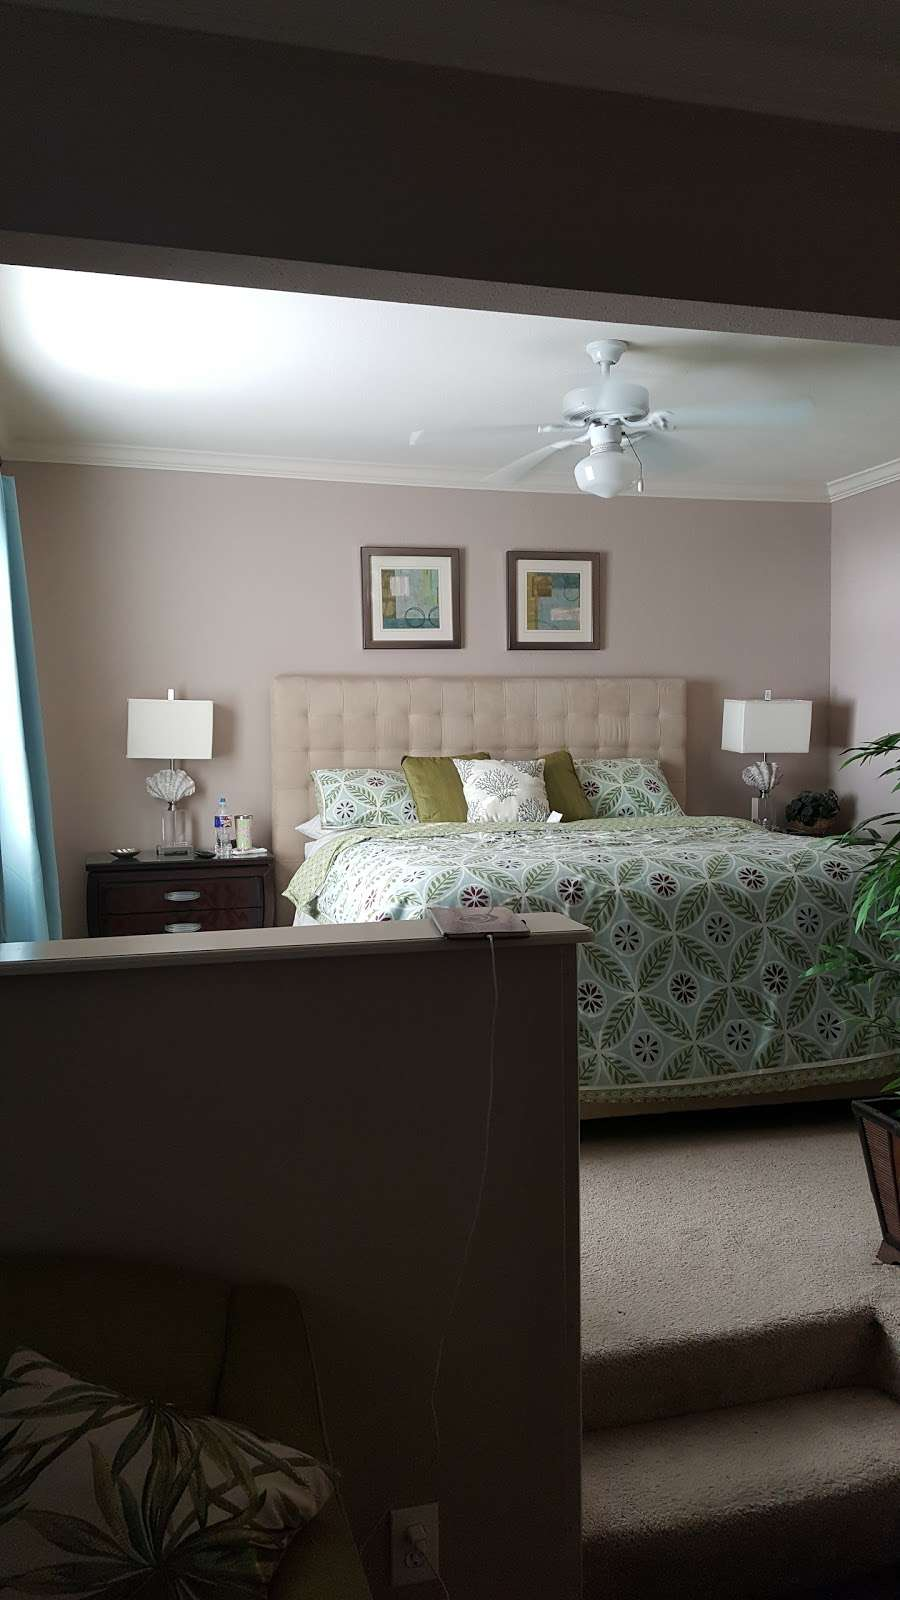 Dawn Beach Condominiums - real estate agency  | Photo 2 of 10 | Address: 7000 Seawall Blvd, Galveston, TX 77551, USA | Phone: (888) 532-9623